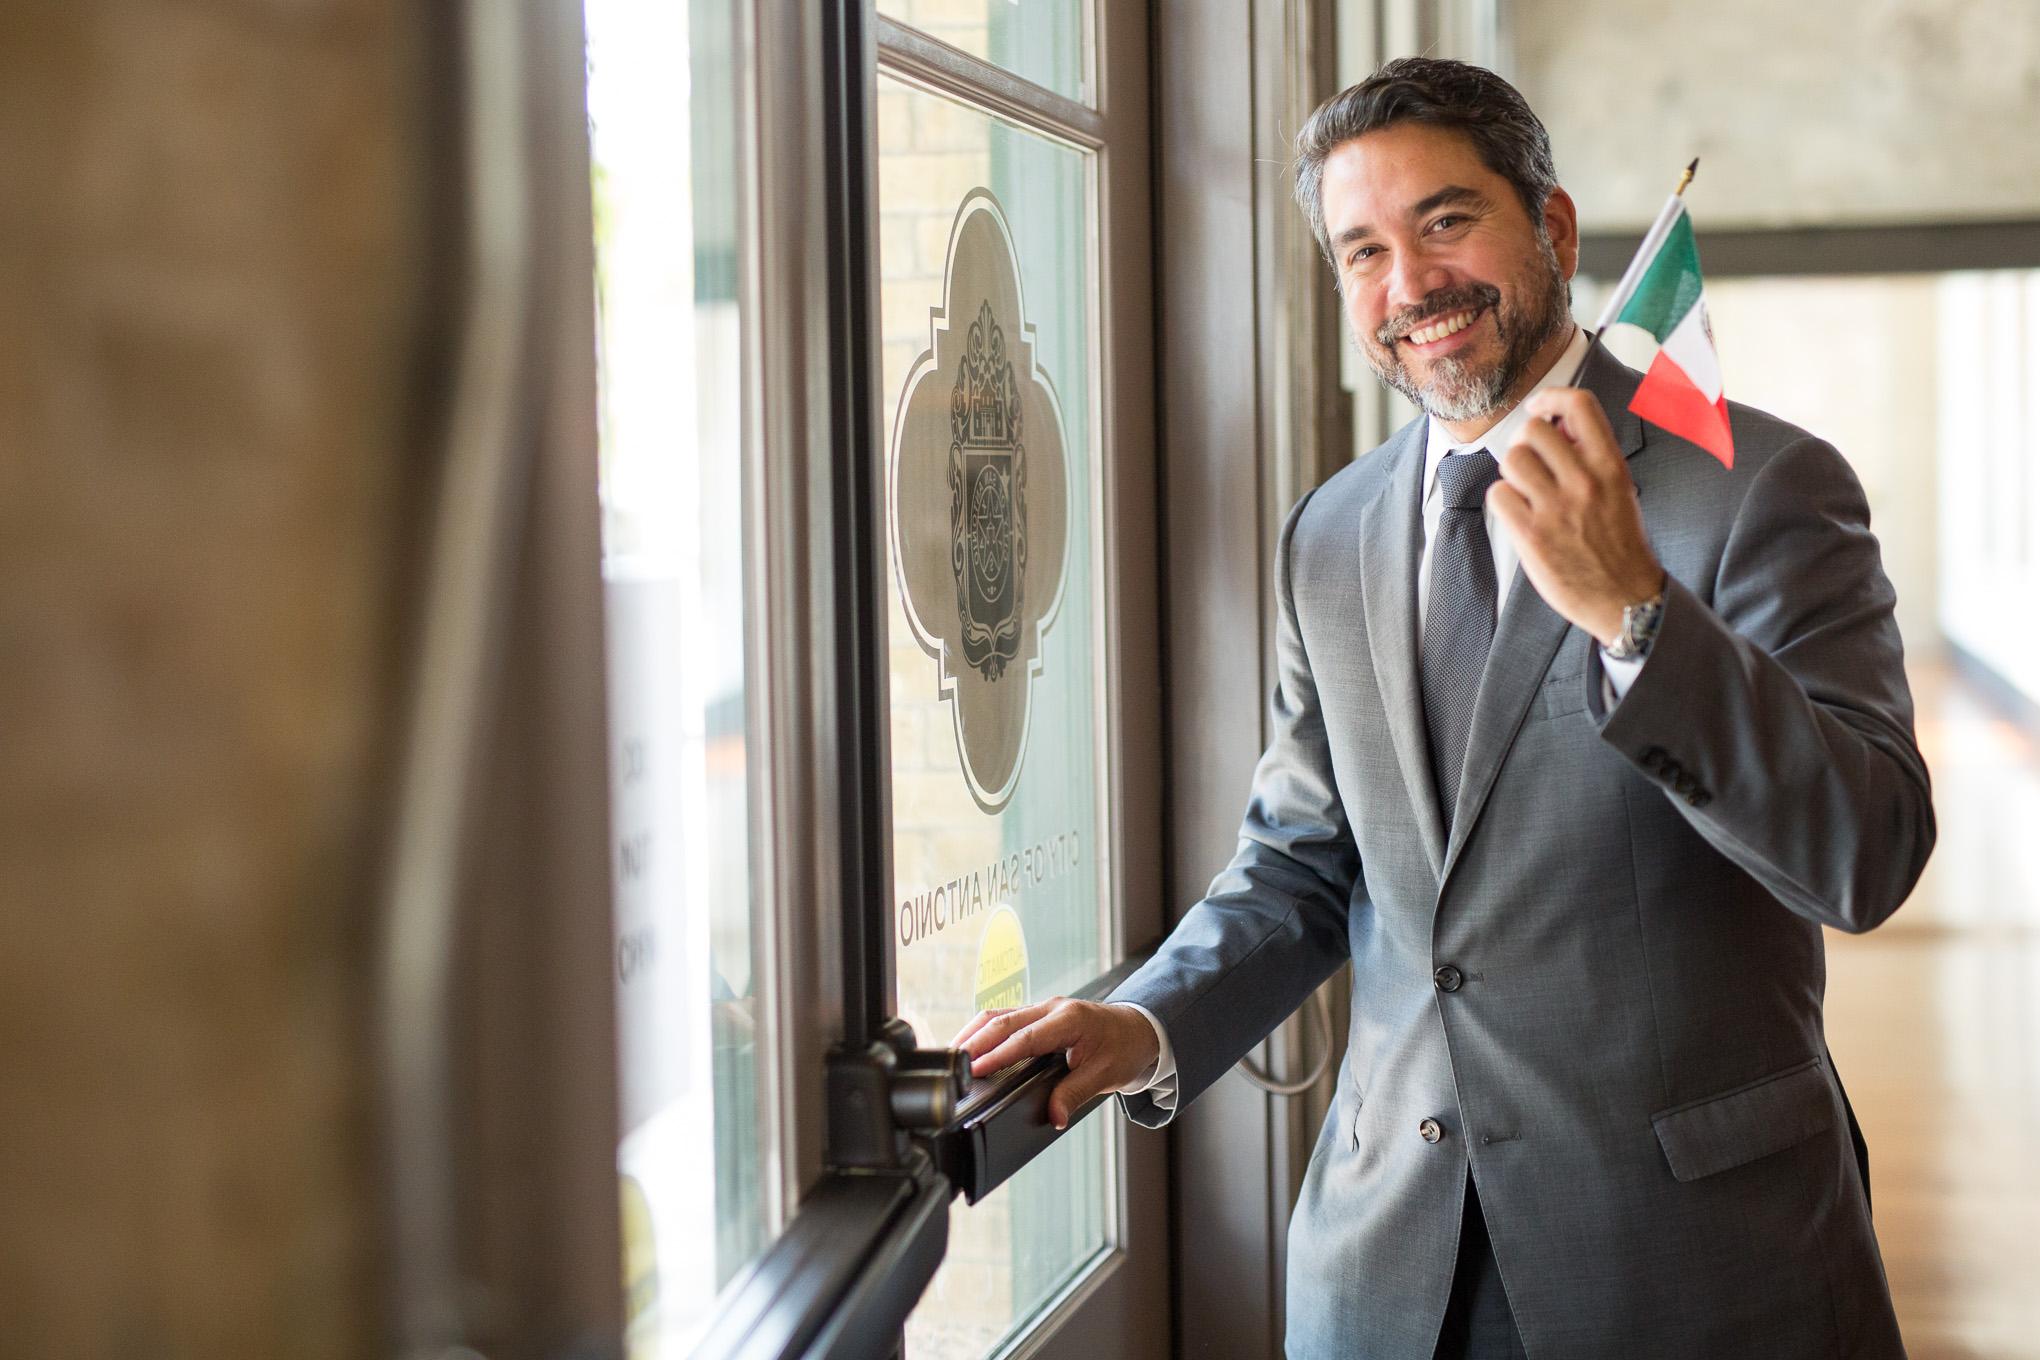 Councilman Roberto Treviño (D1) waves a miniature Mexican Flag following the public announcement. Photo by Scott Ball.